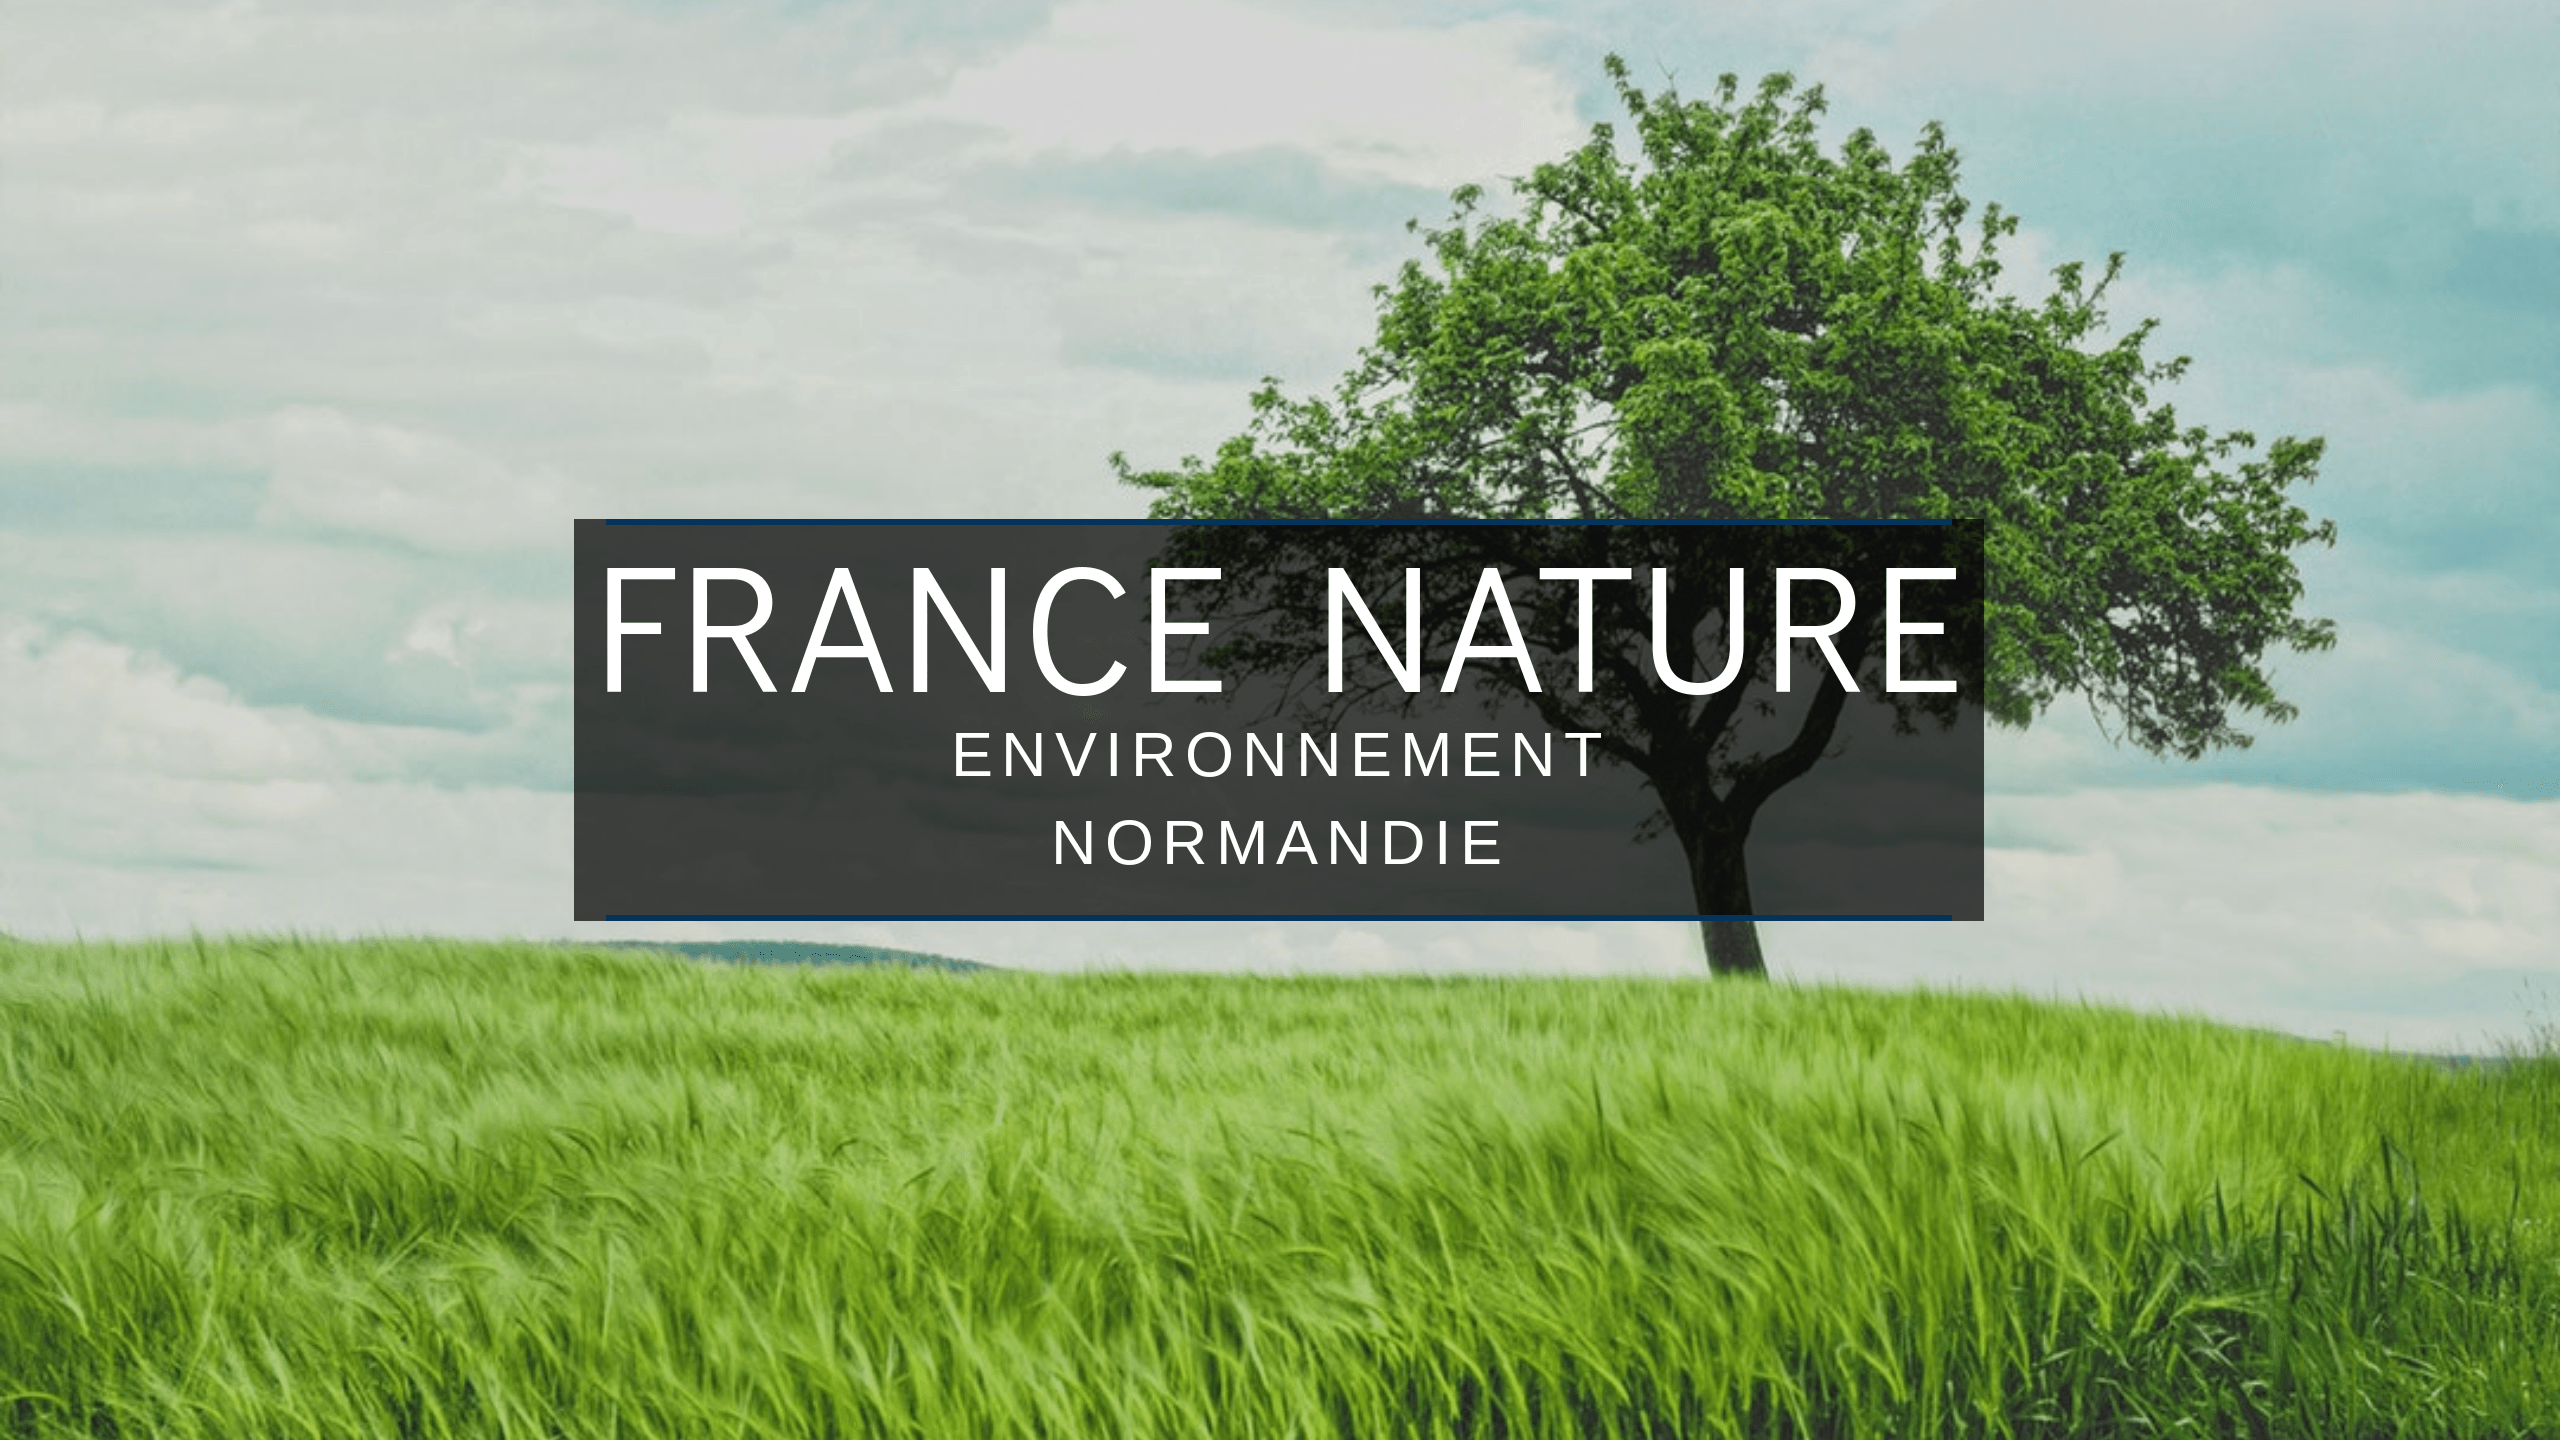 France nature environnement (1)